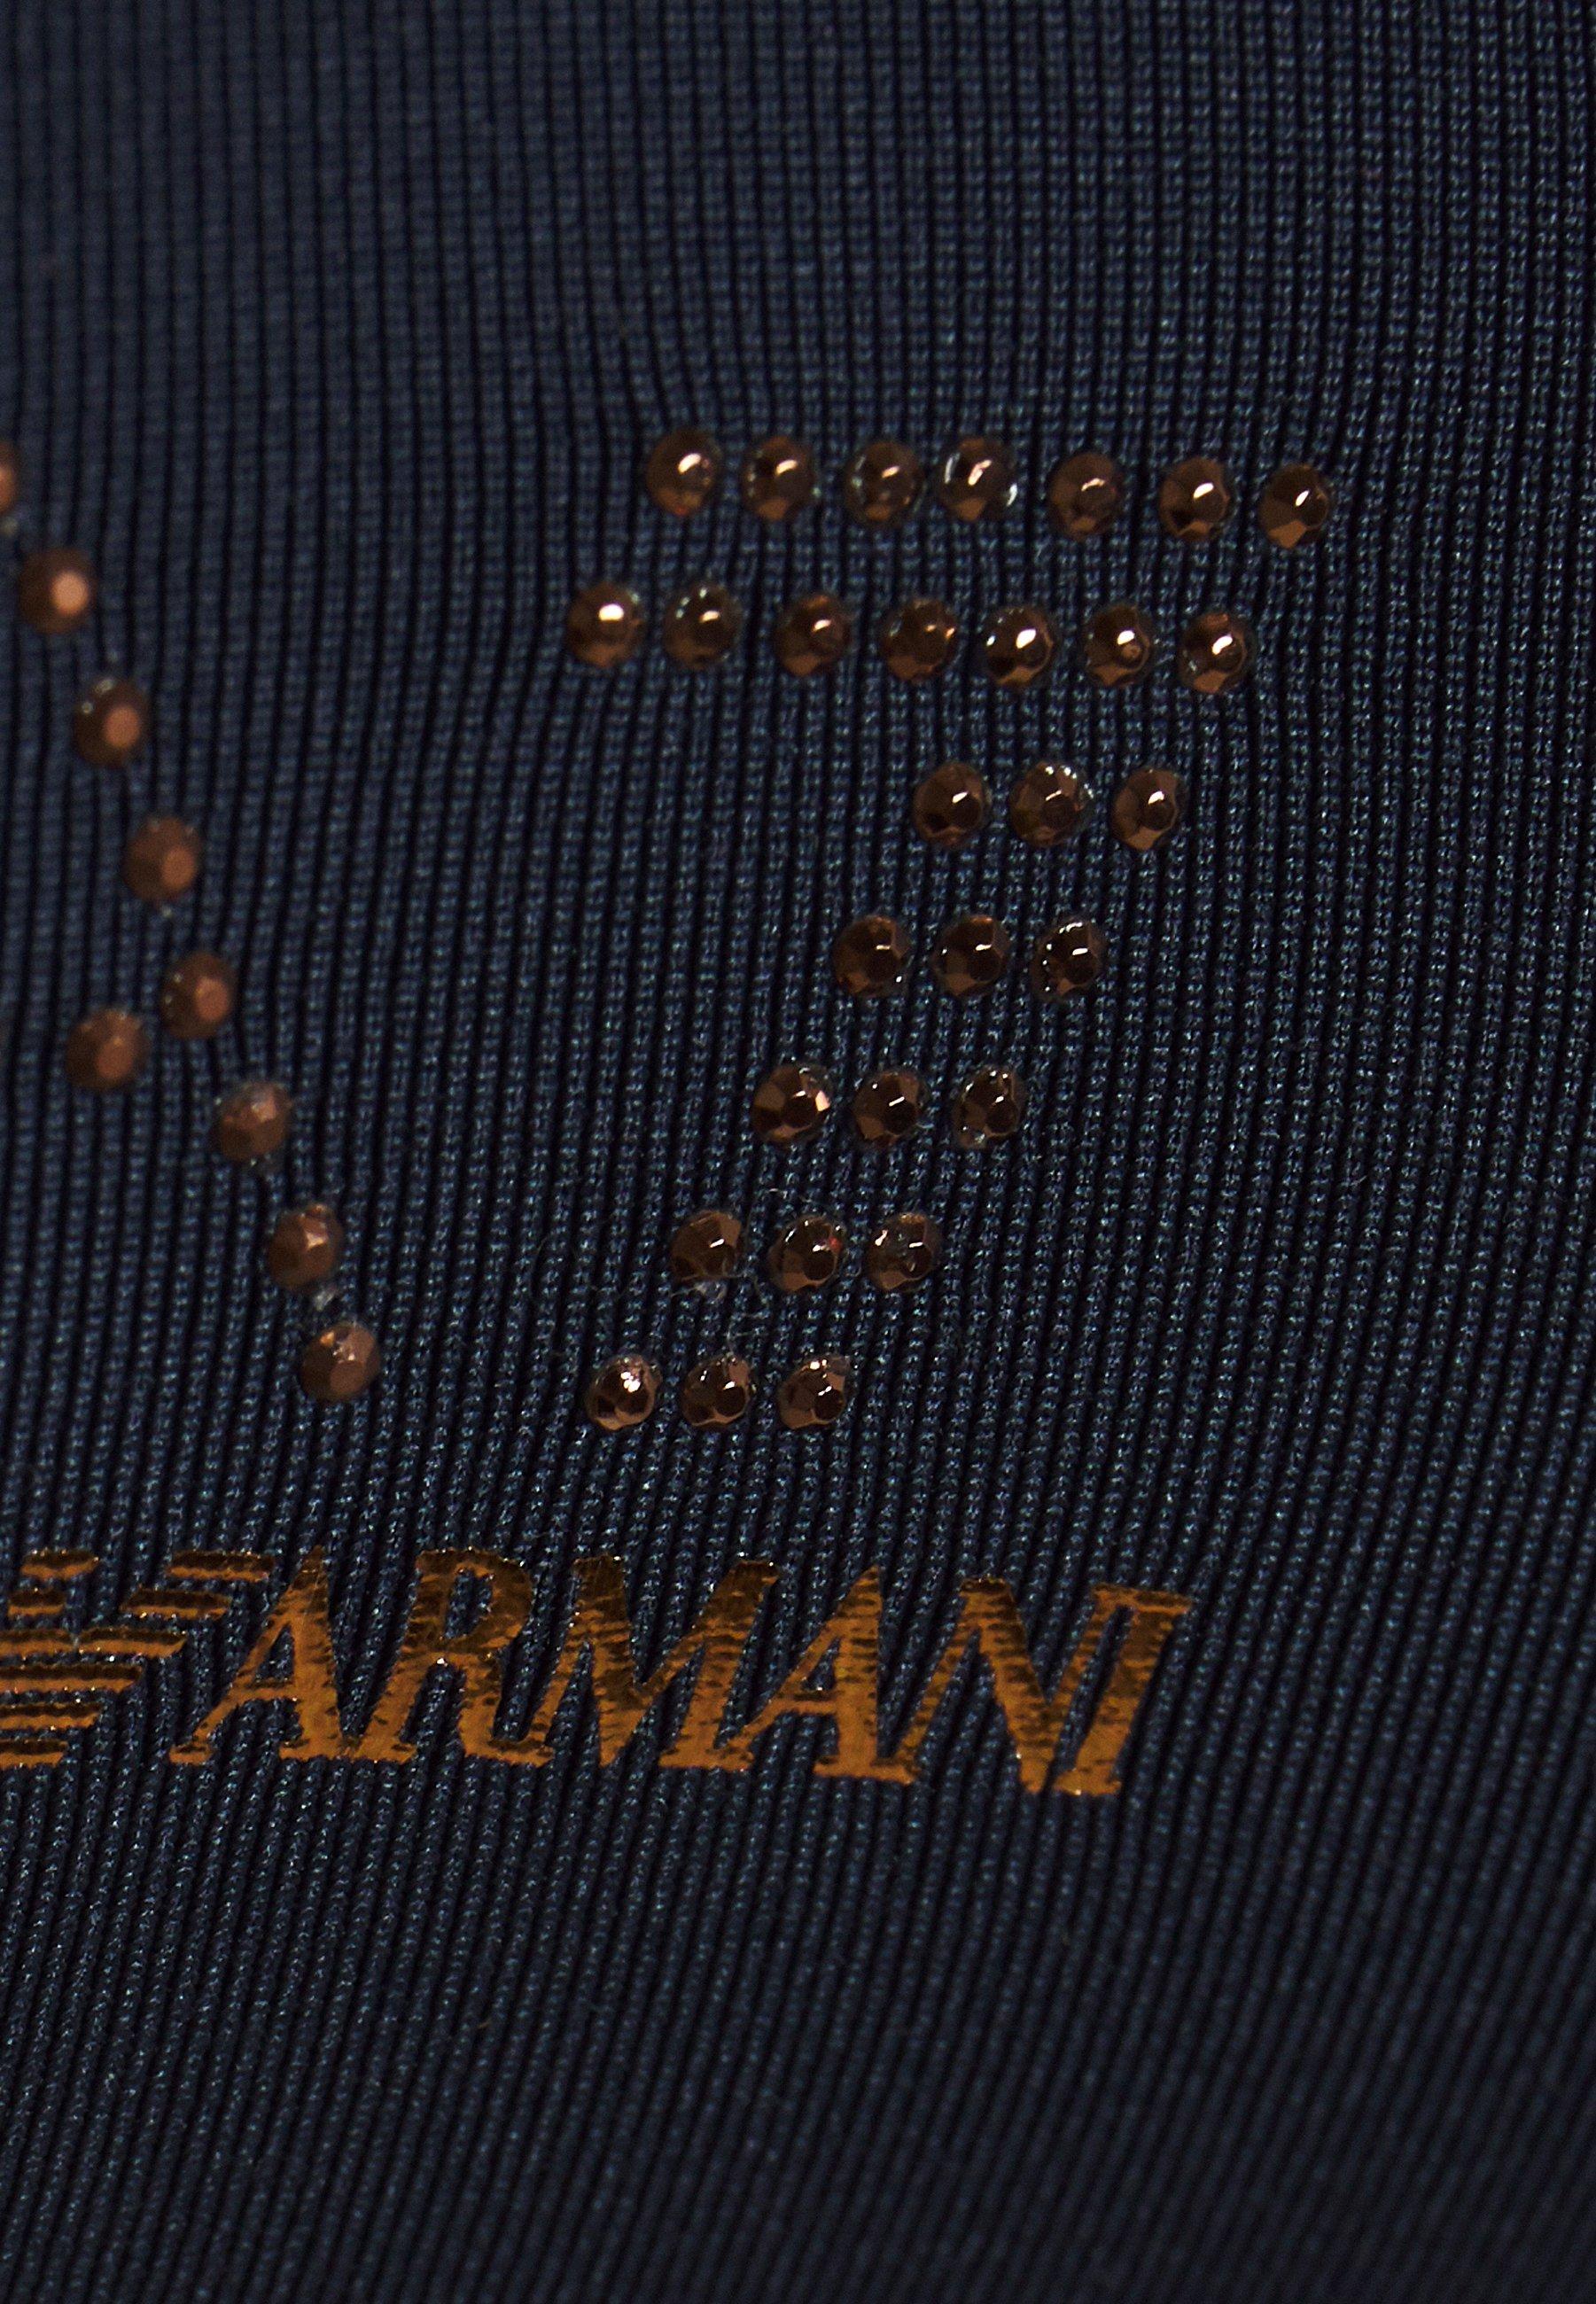 Ea7 Emporio Armani Sea World Studs Band Set - Bikini Navy Blue Black Friday